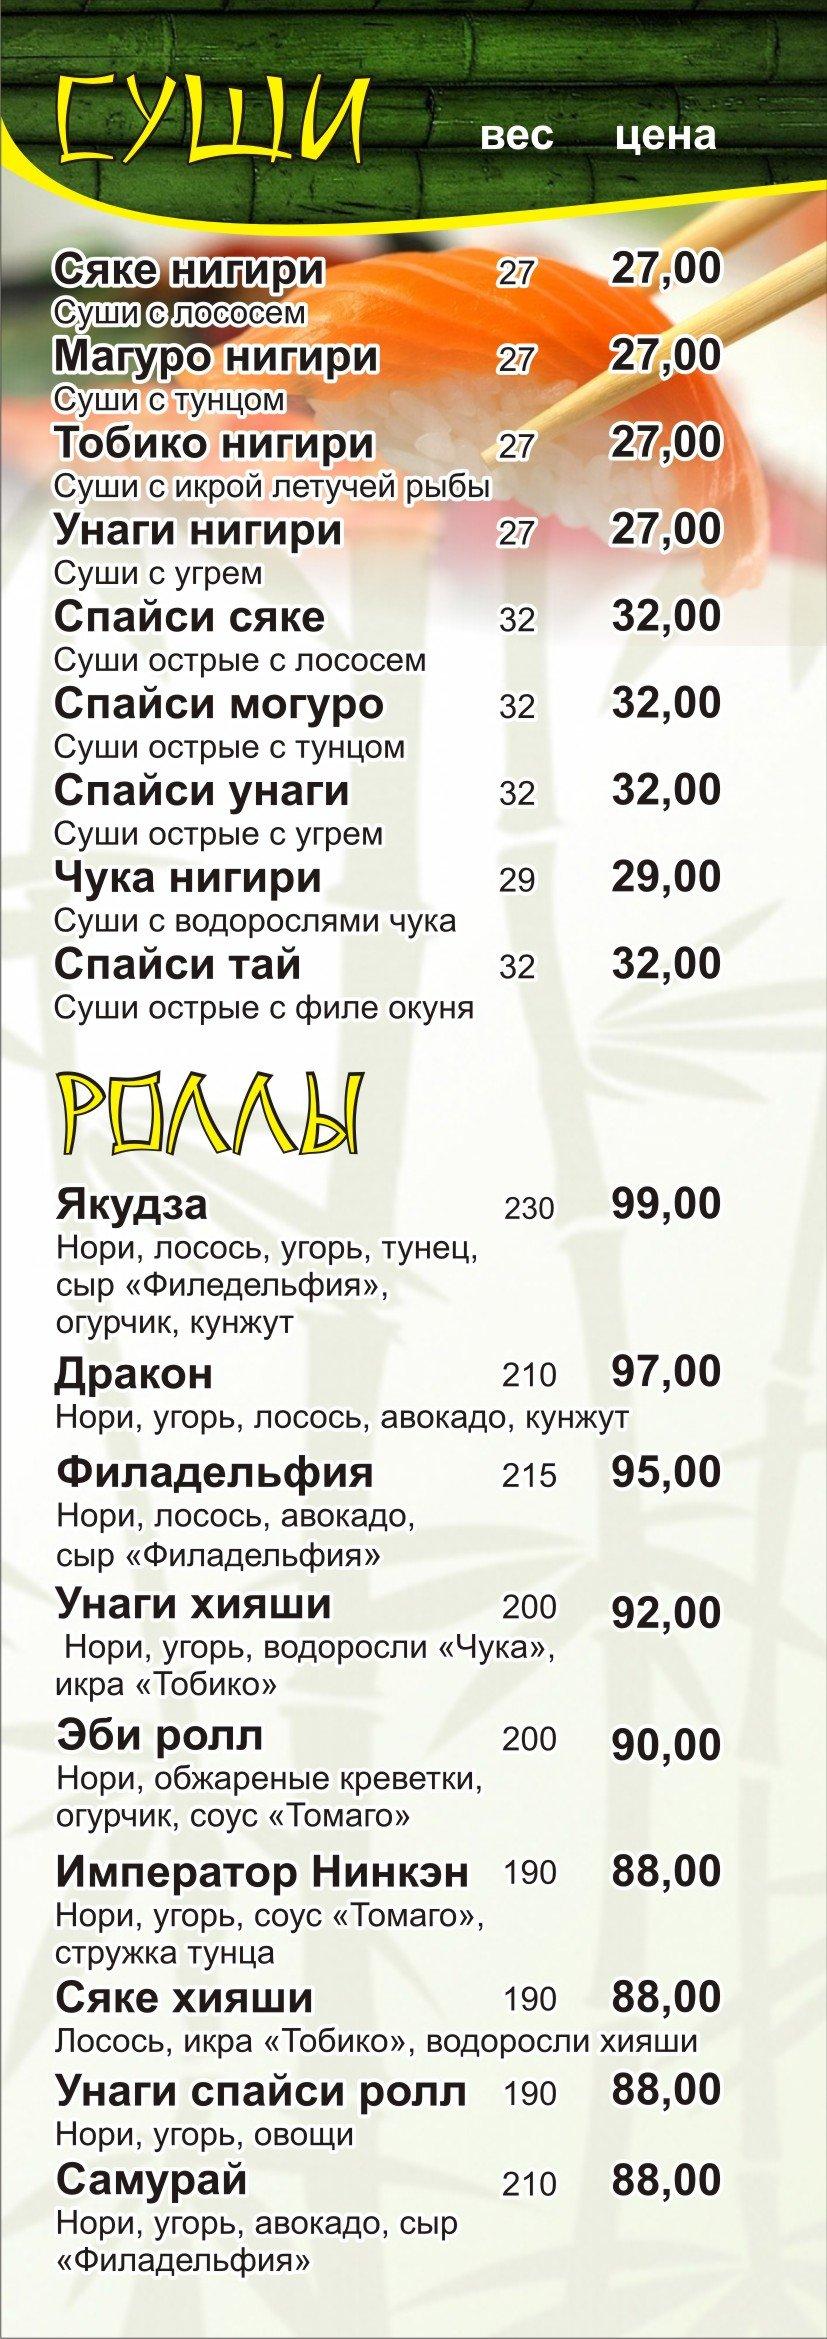 "Суши бесплатно! Праздничное предложение от кафе ""Панда - пицца, роллы"", фото-1"